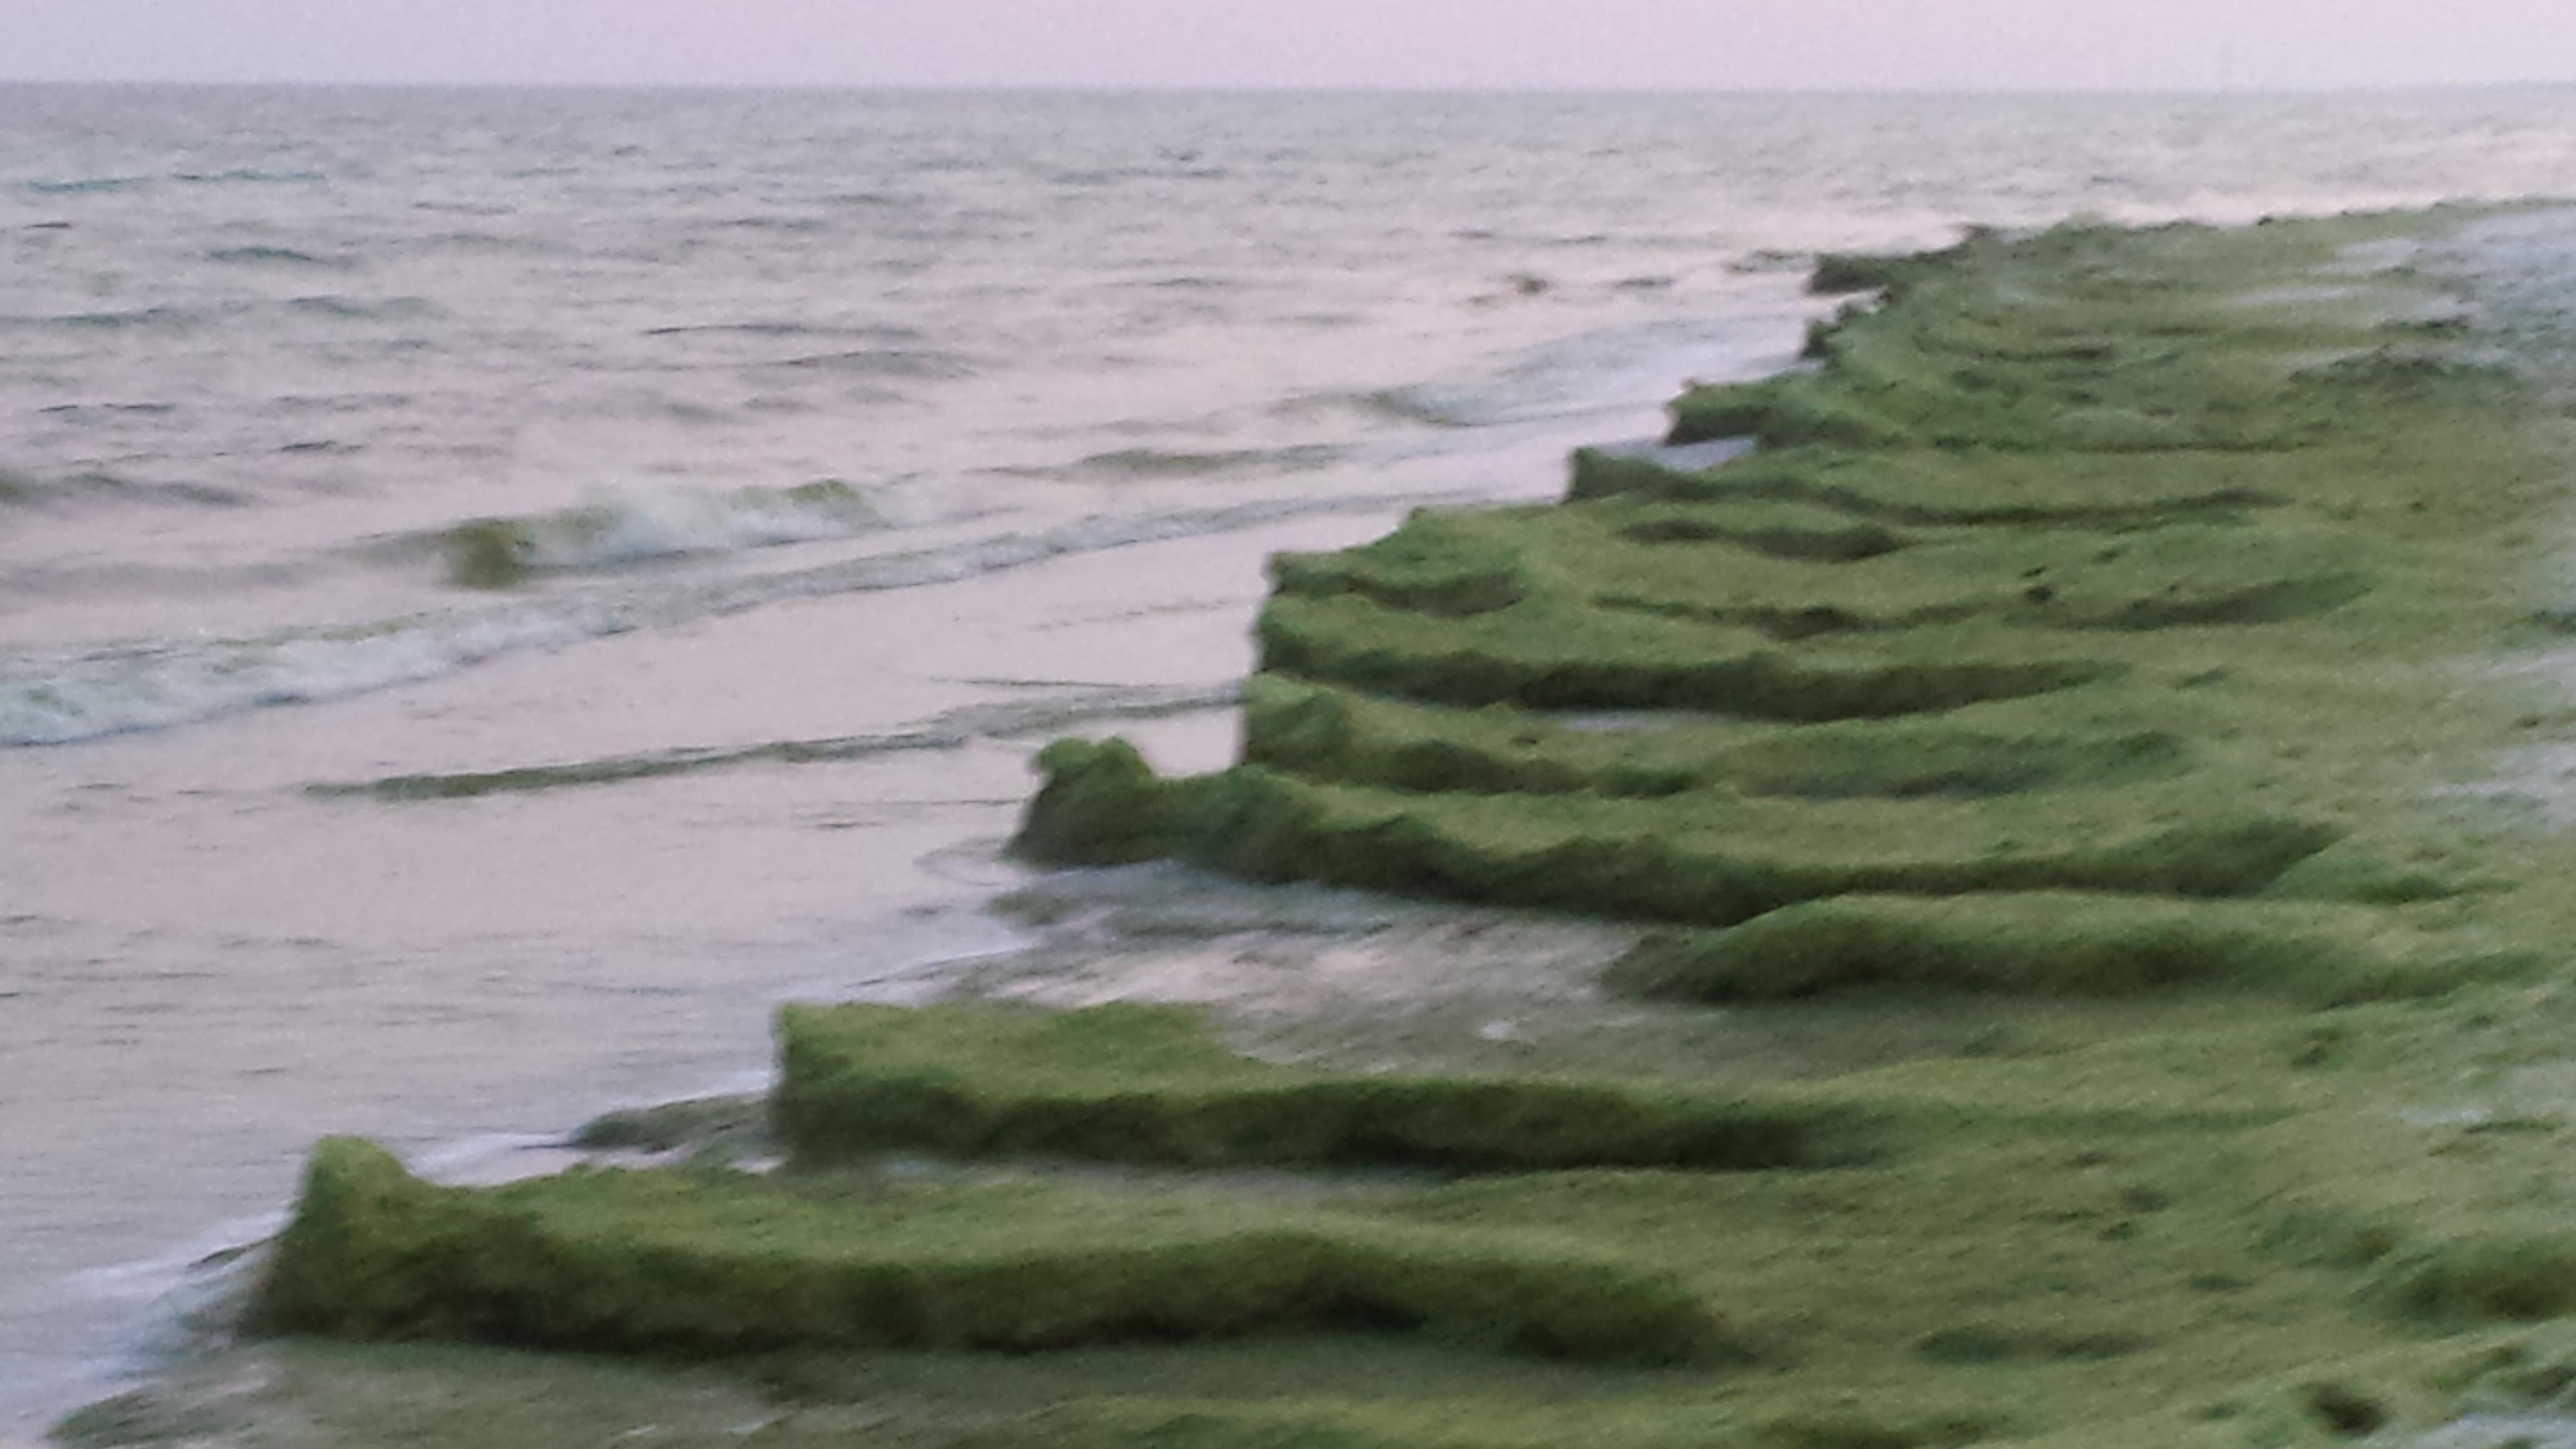 The June Grass Report   Crowdsourced June Grass and Beach Updates